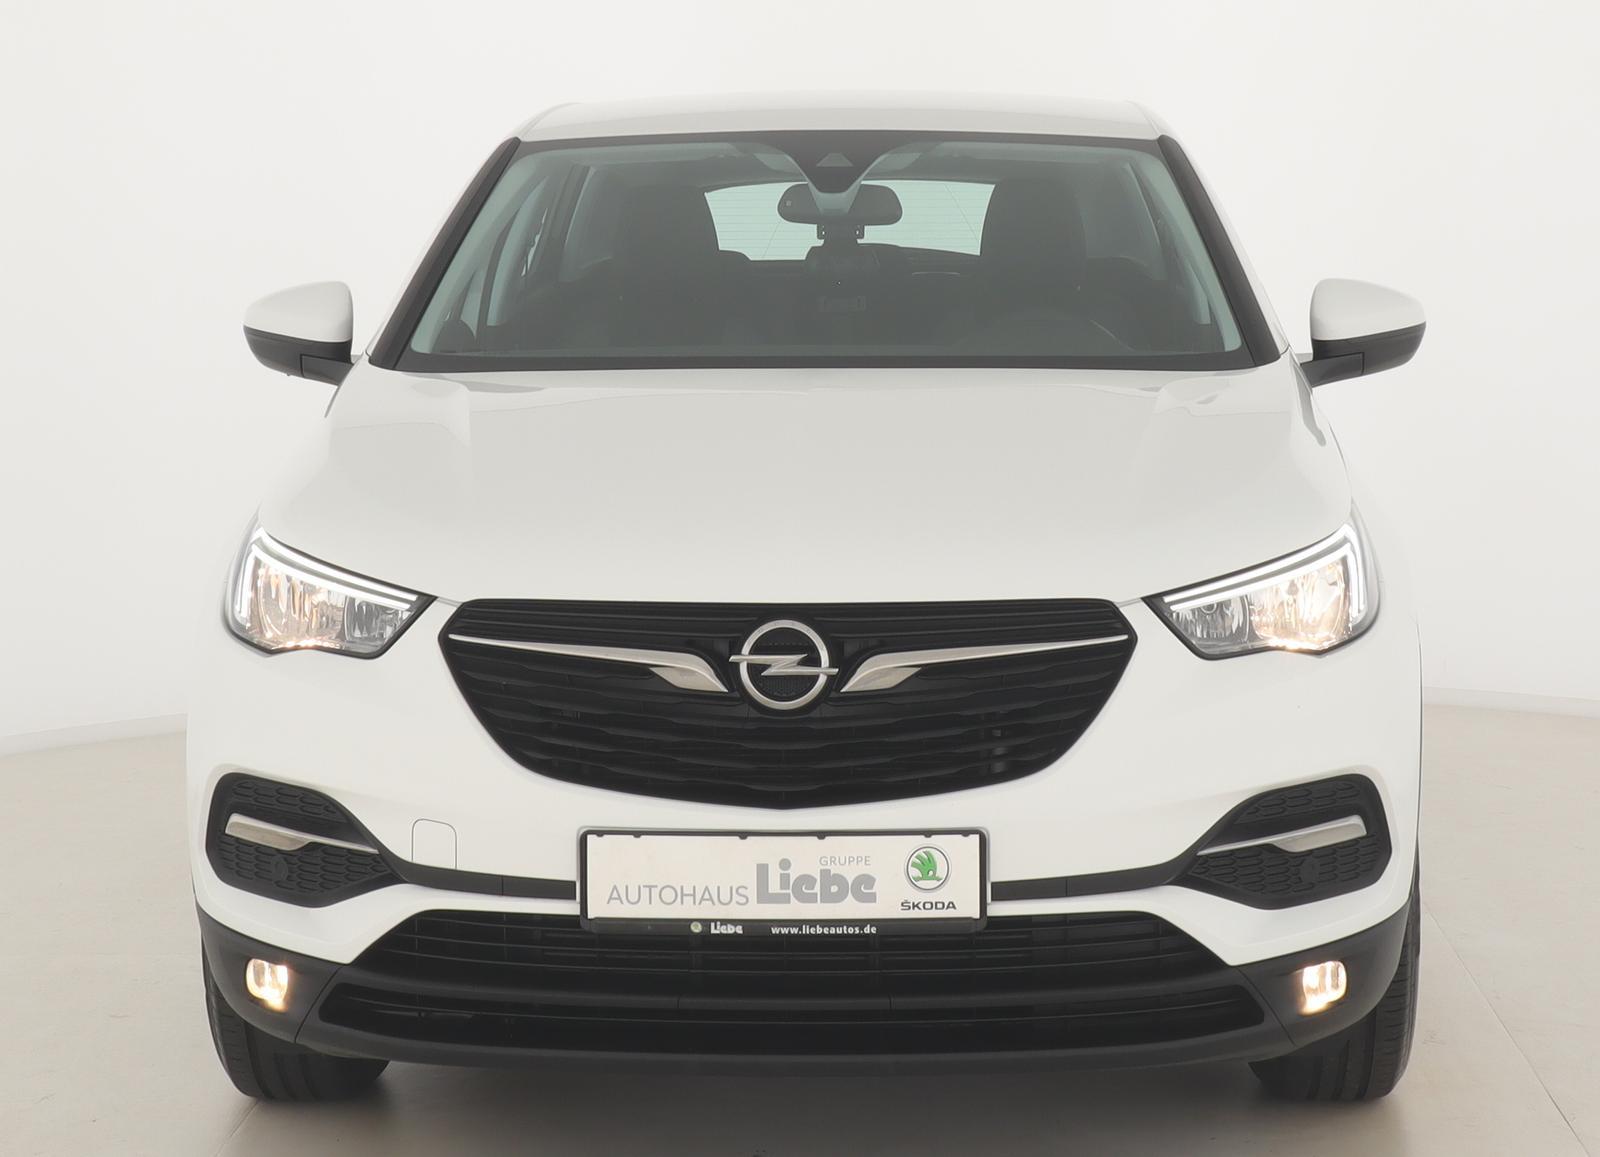 Opel GRANDLAND X EDITION 1.2 1. HAND|NAVI|PDC|SHZ|AHK, Jahr 2018, Benzin